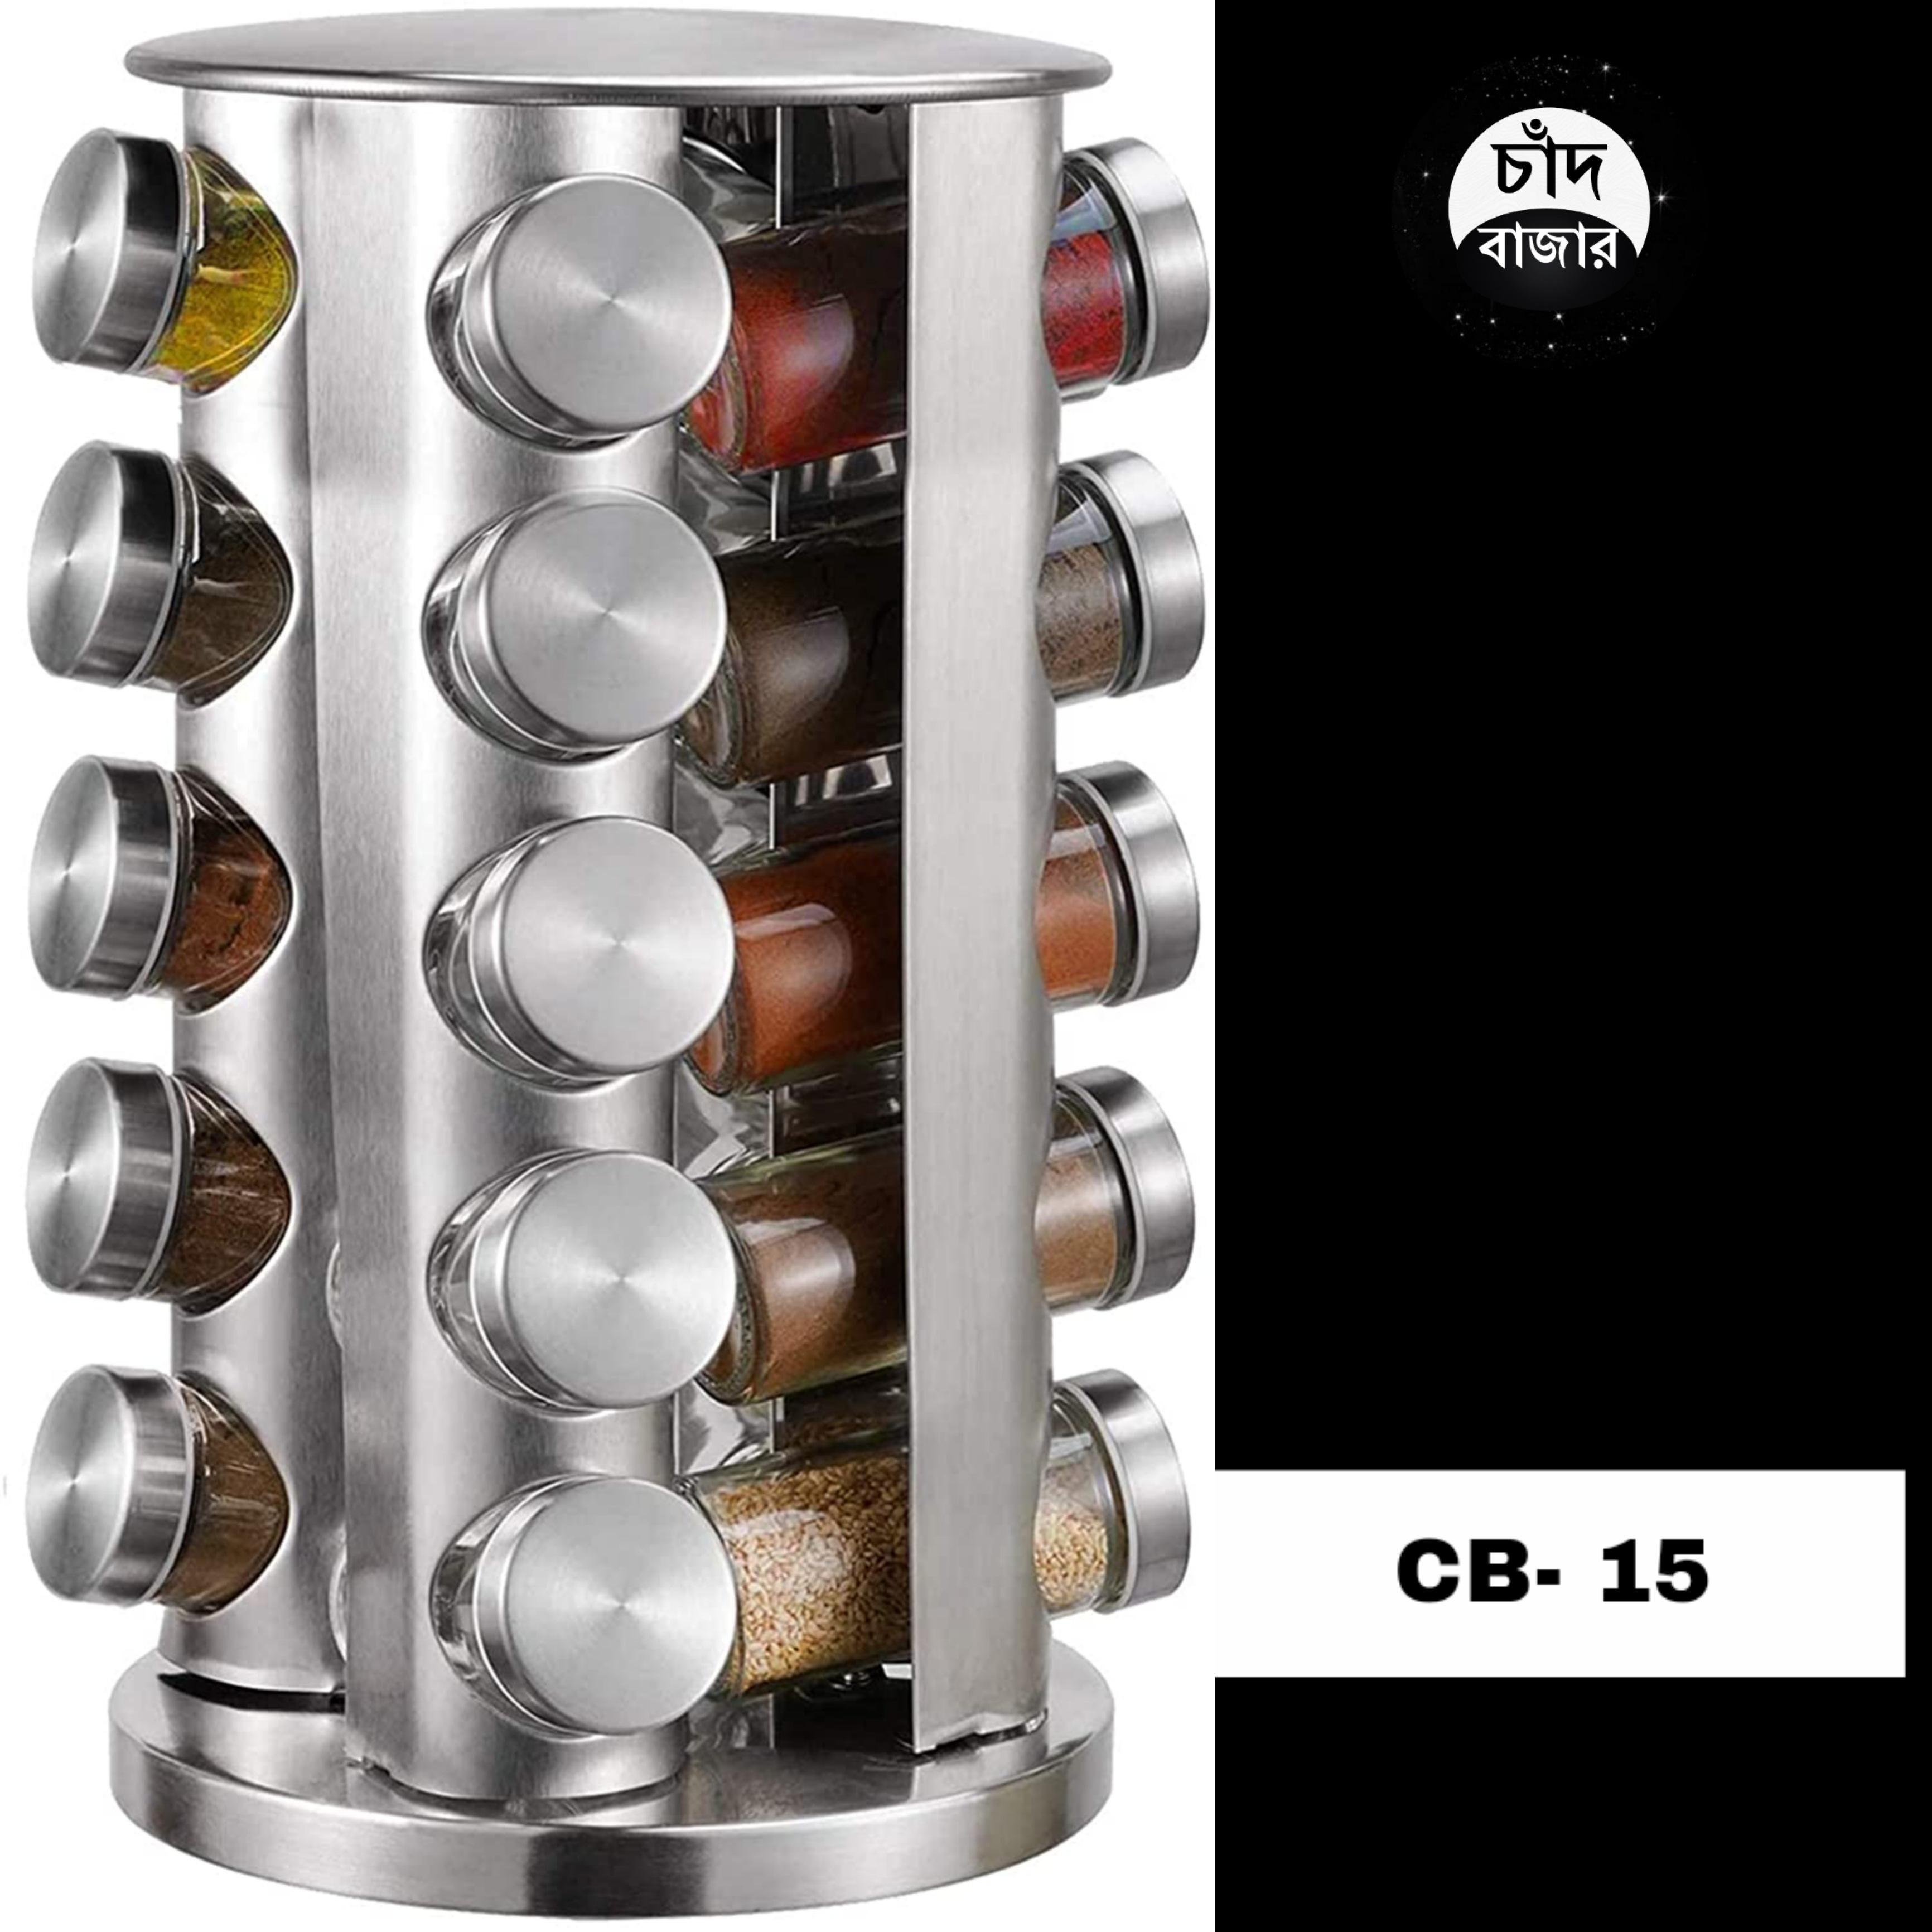 Stainless Steel Revolving Spice Rack Organizer (16pcs. Jar Set)